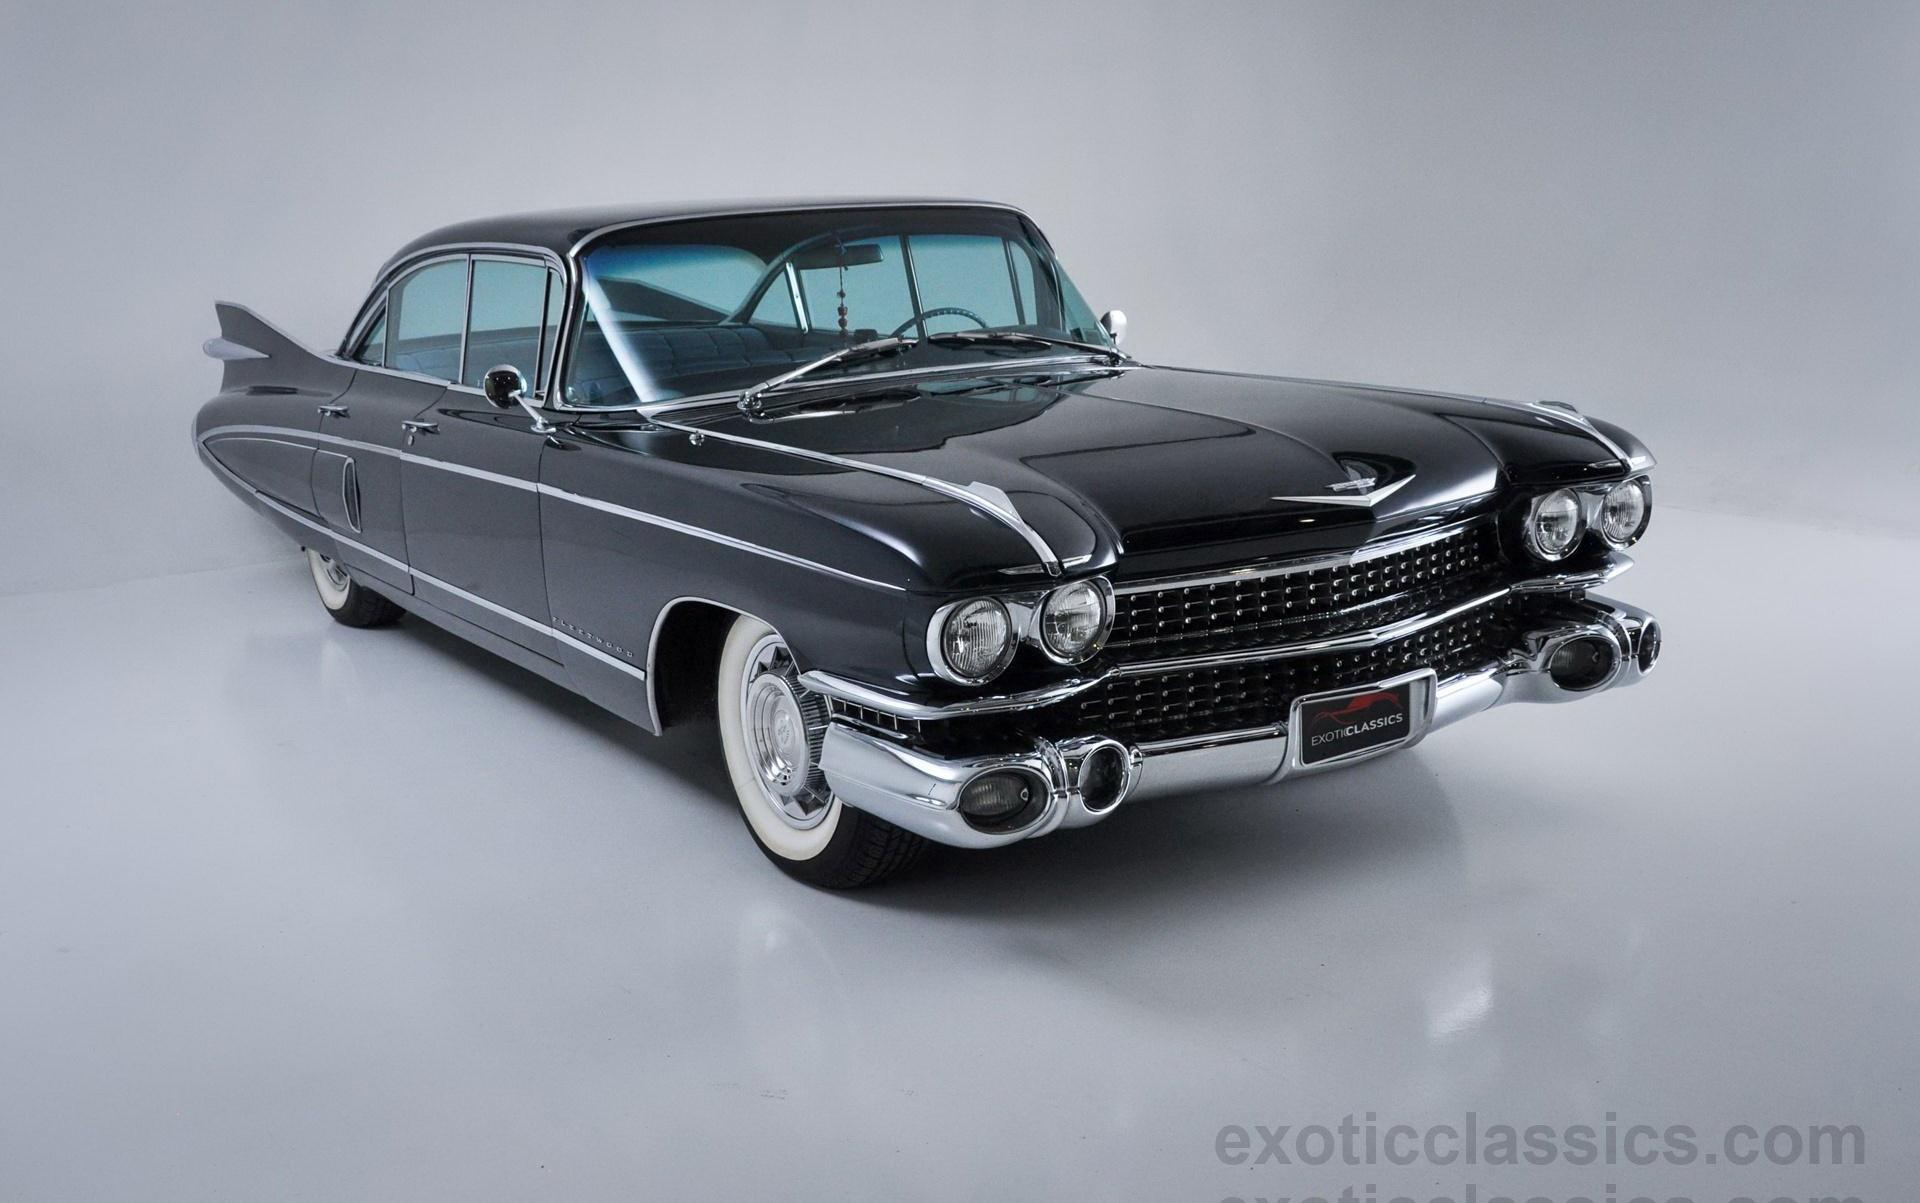 Used Cars Long Island >> 1959 Cadillac Fleetwood - Champion Motors International l Exotic Classic Car Dealership New York ...